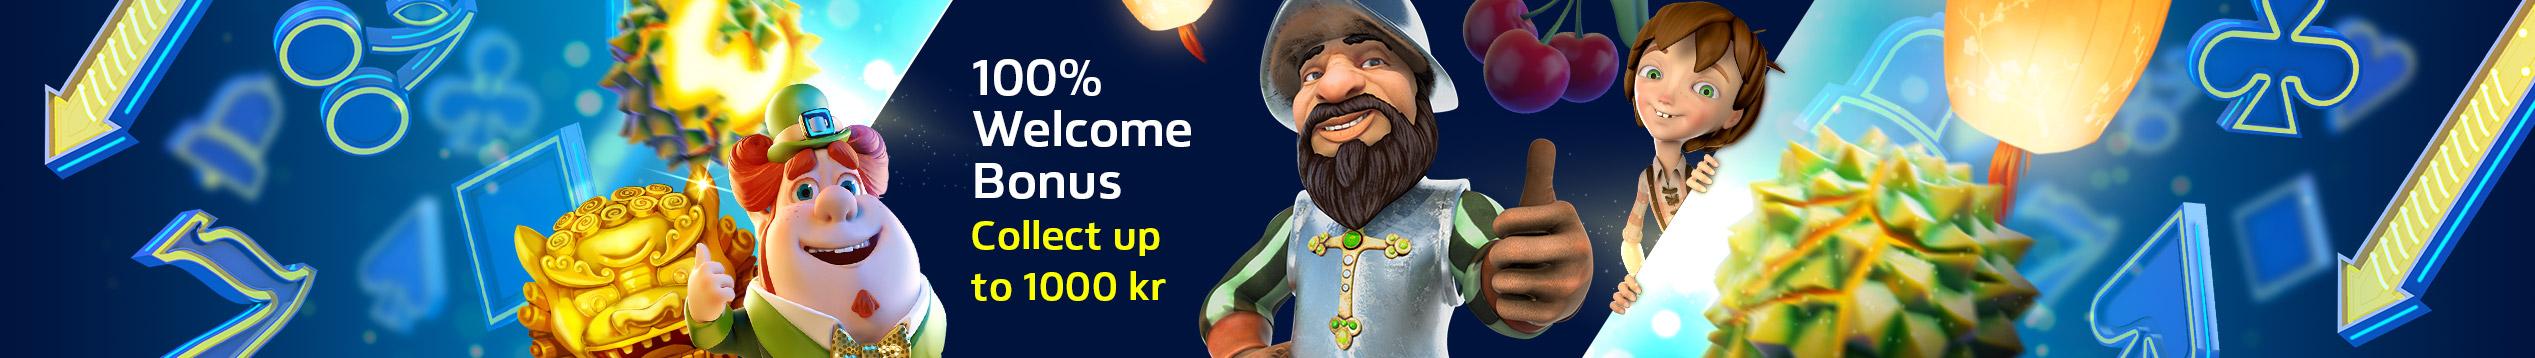 Welcome bonus on Slots